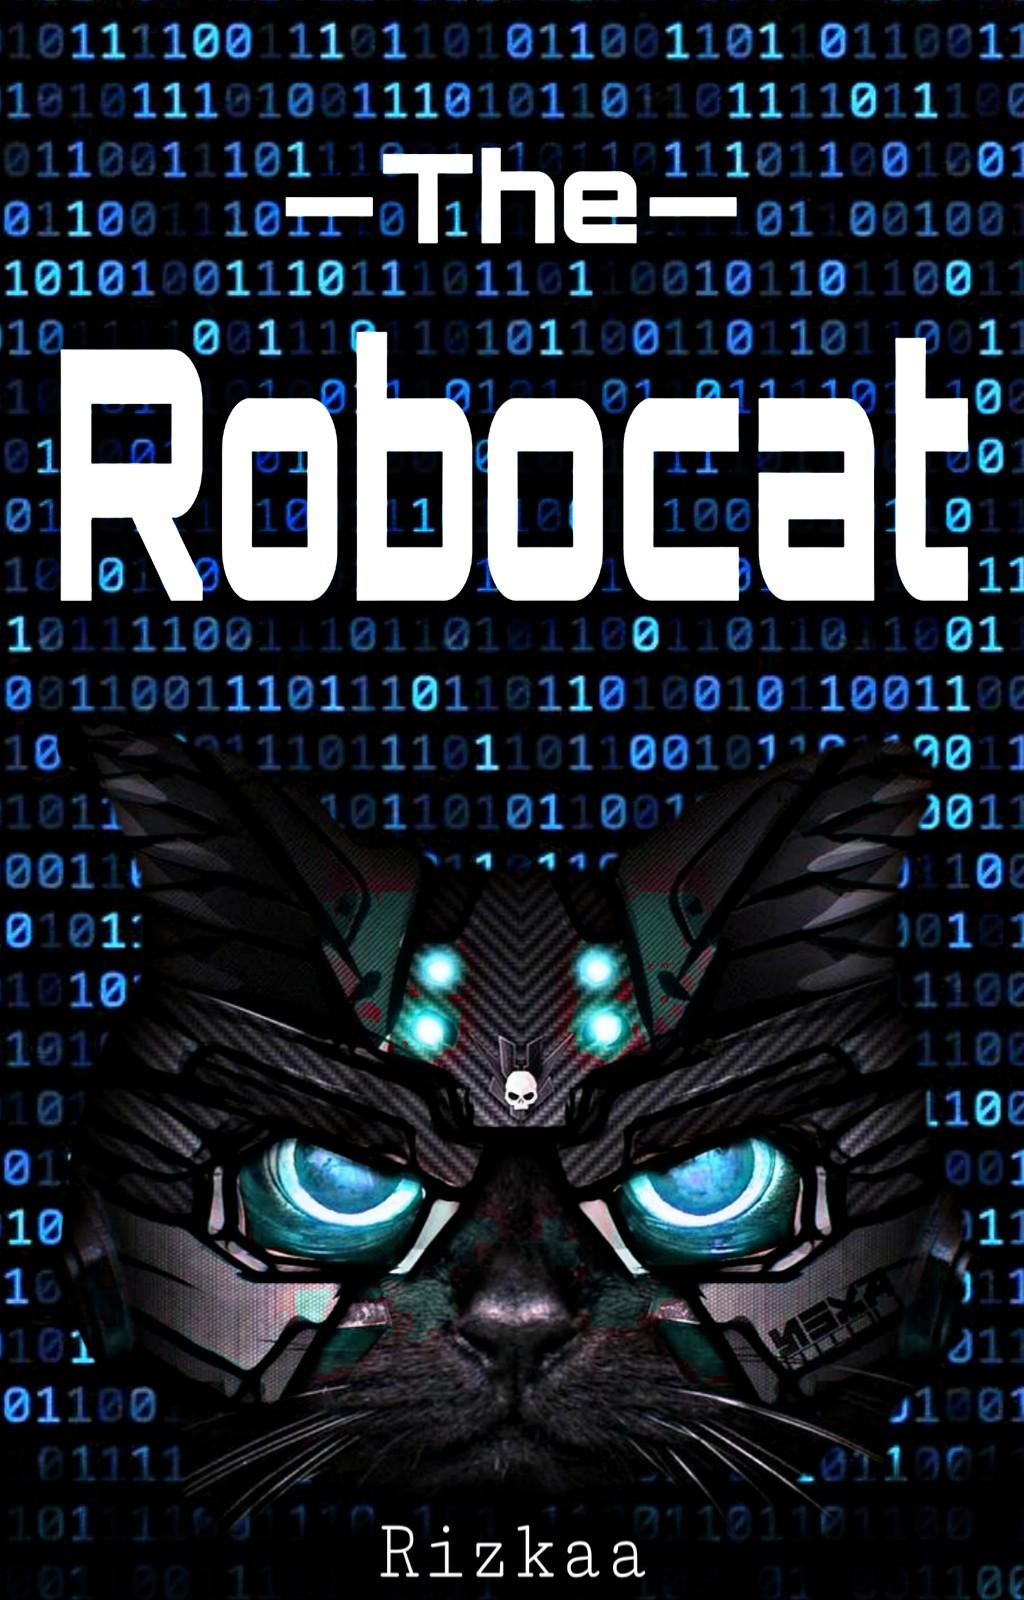 The Robocat